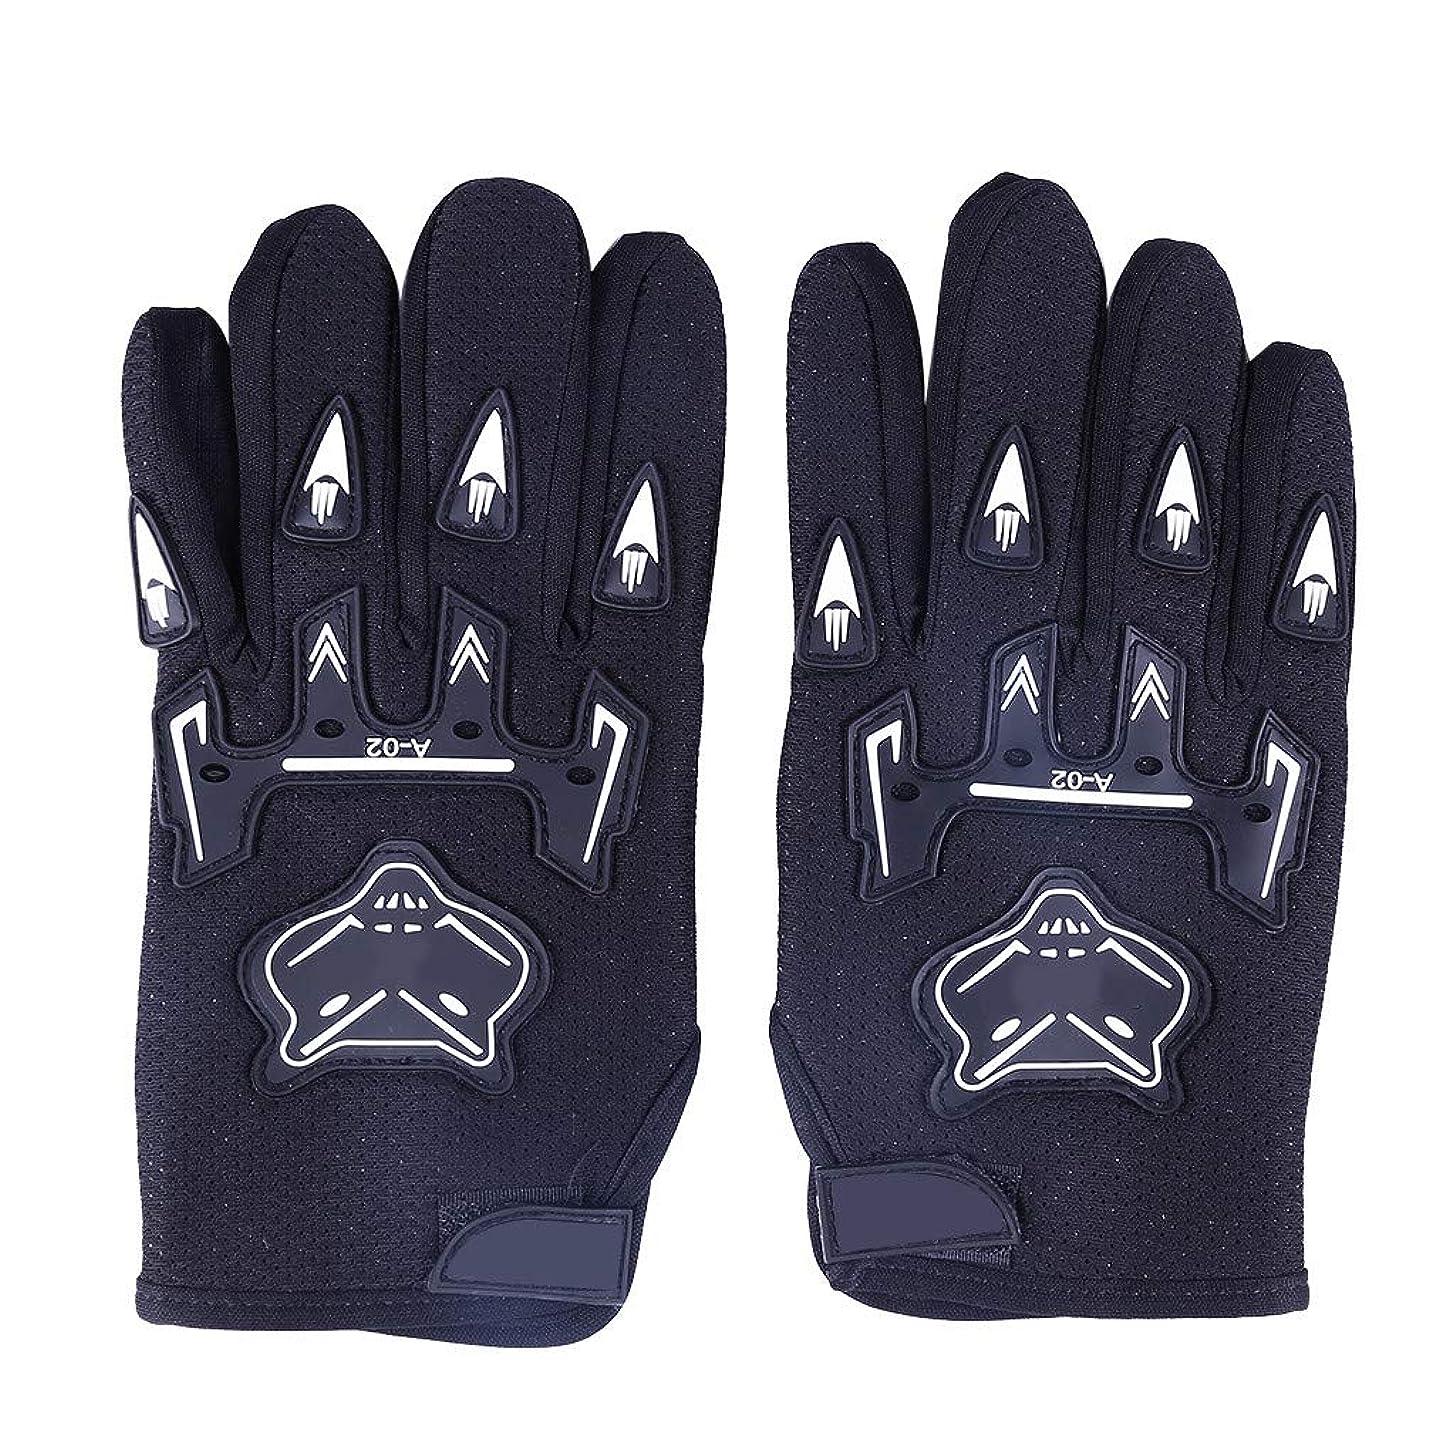 Ikevan 2019 Ridding Gloves Full Finger Glove Racing Motorcycle Gloves Cycling Bicycle MTB Bike Riding (Black)